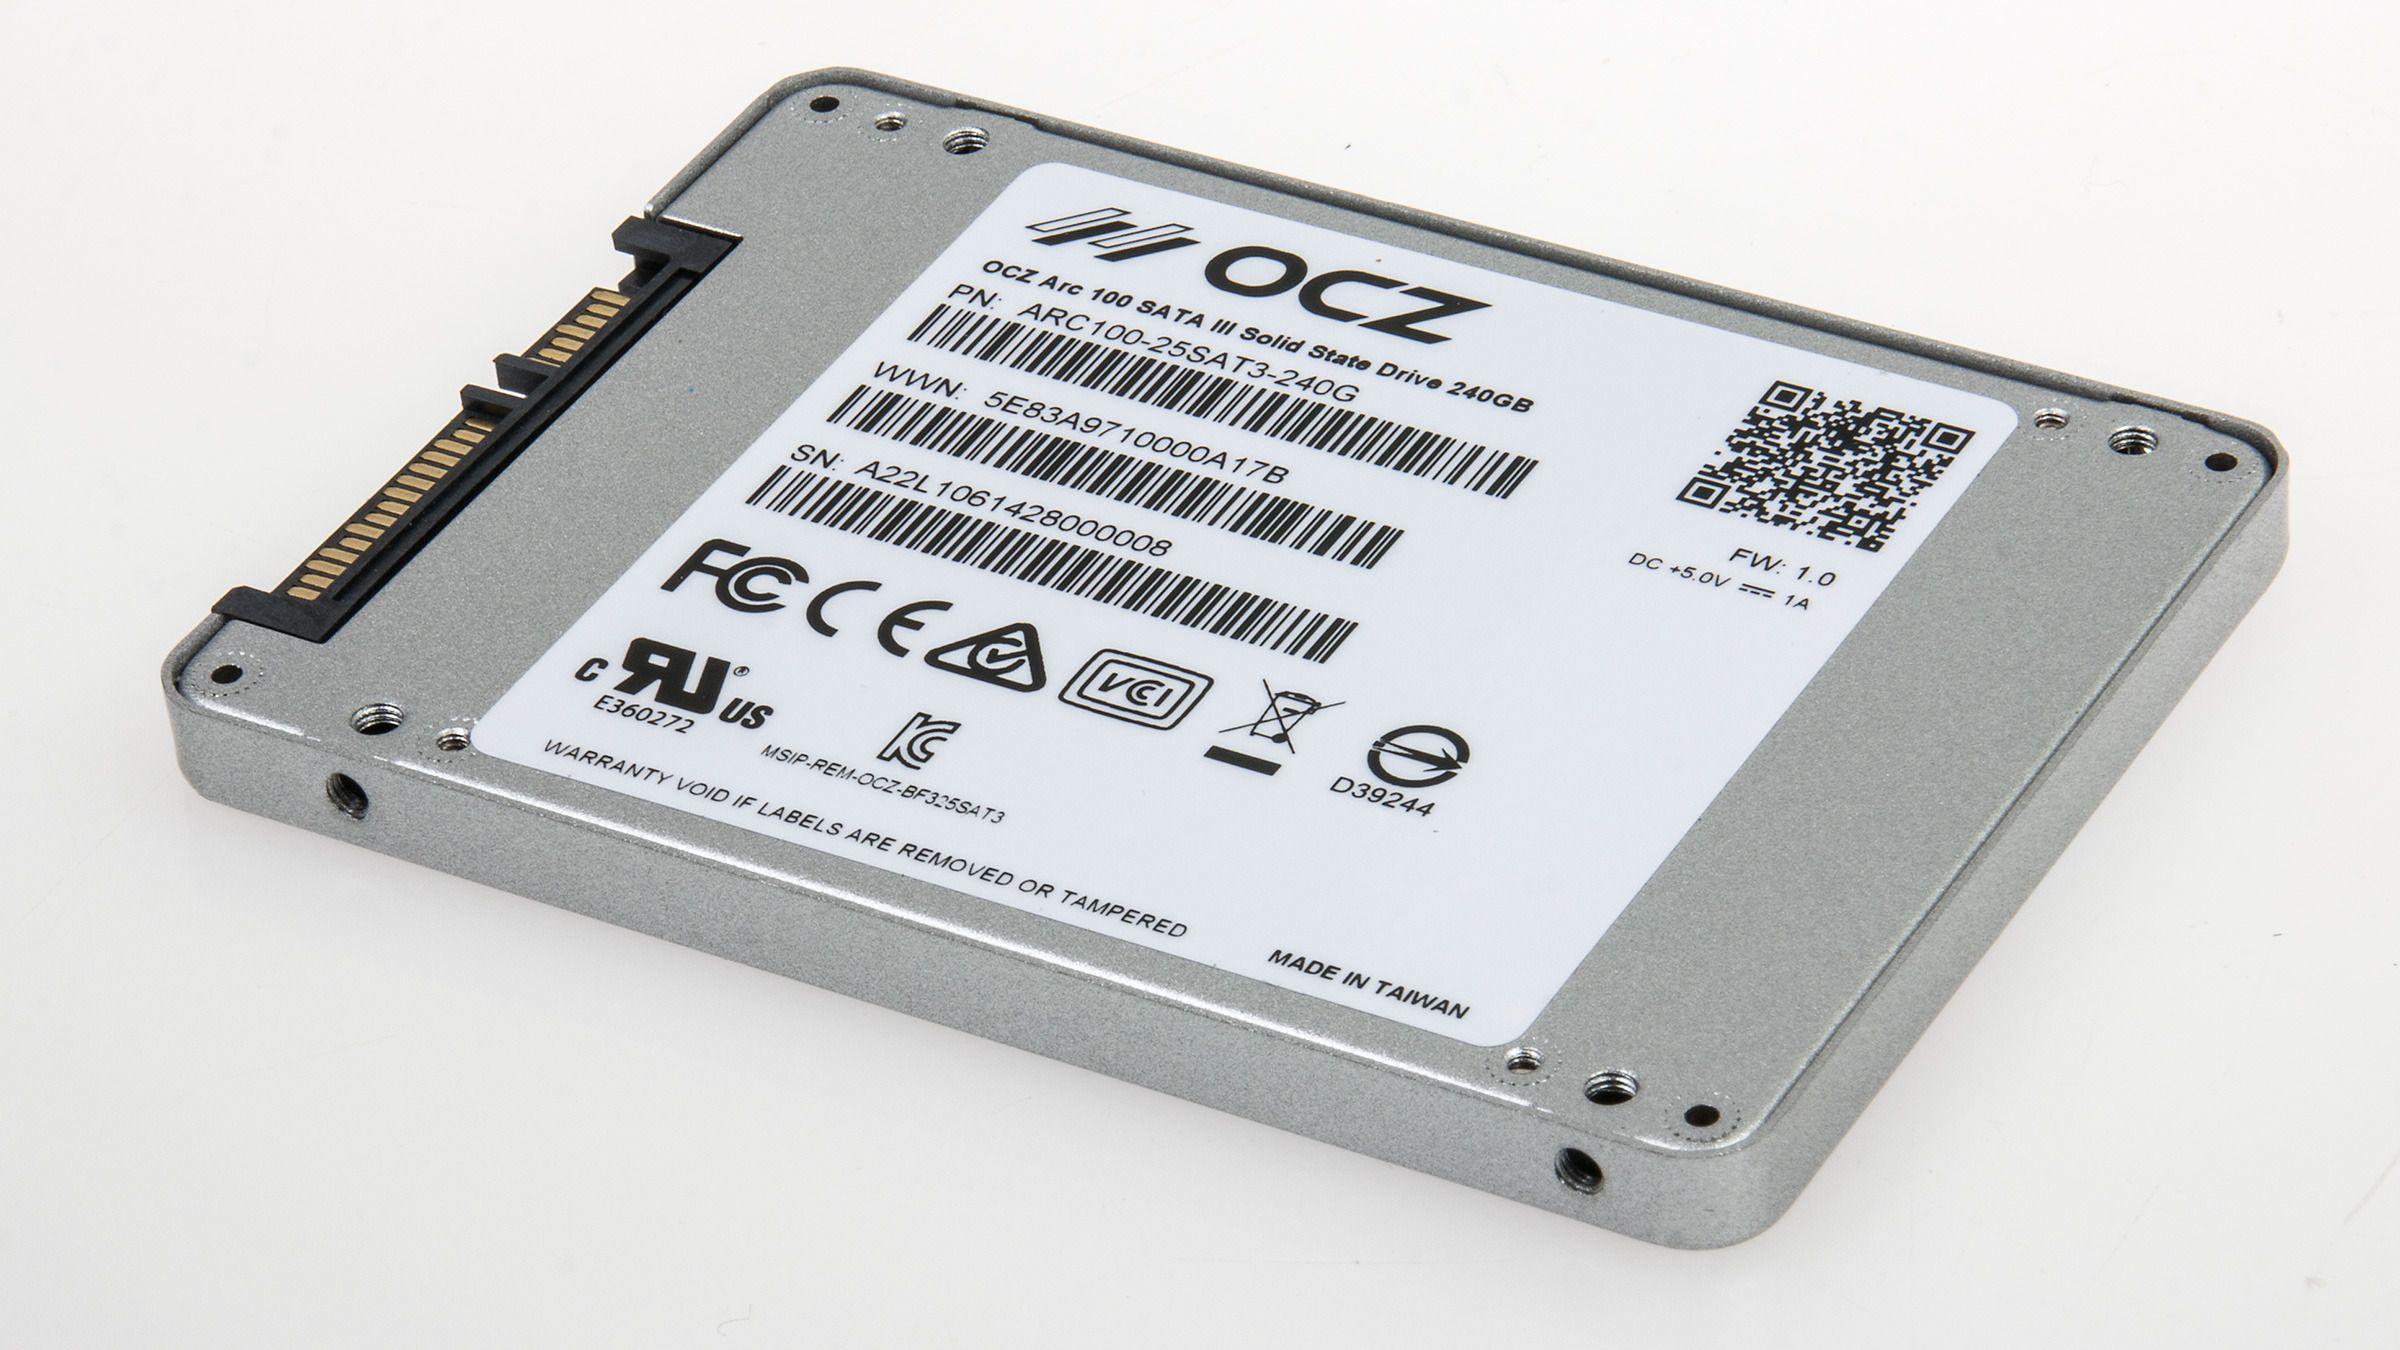 OCZ Arc 100 240 GB SSD.Foto: Varg Aamo, Hardware.no